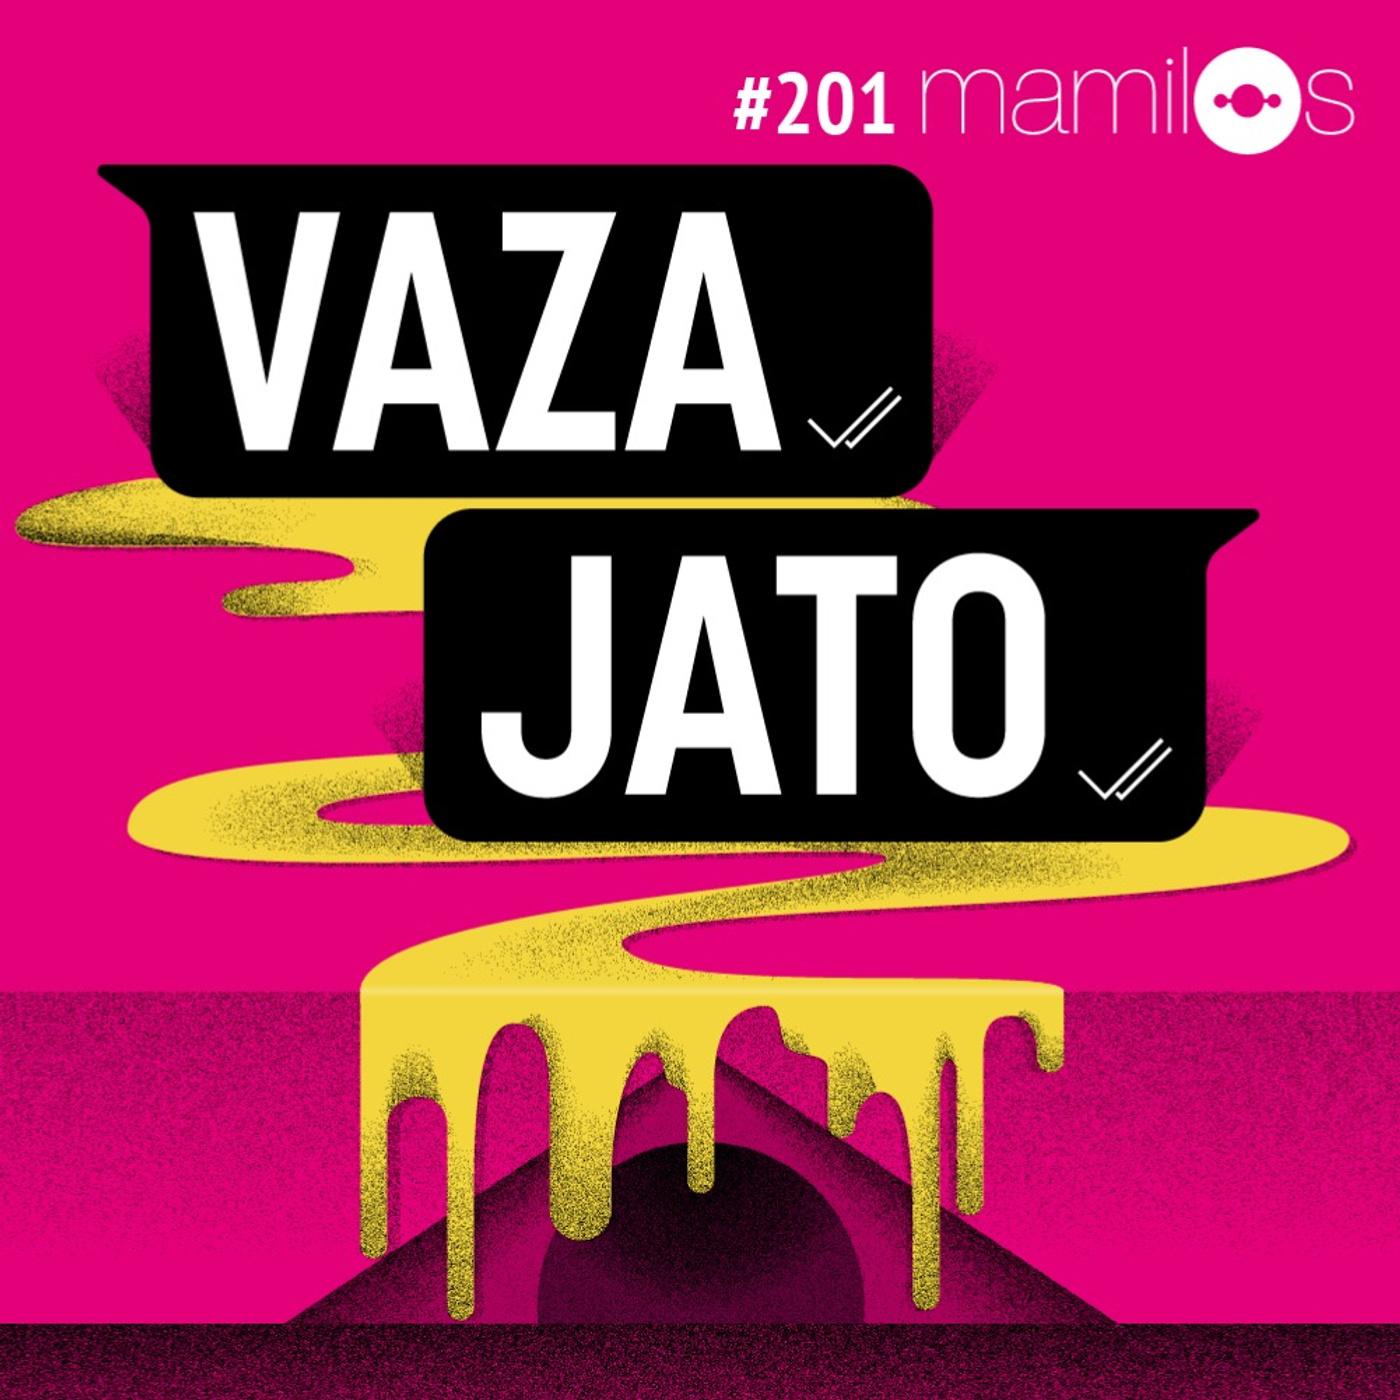 Vaza Jato